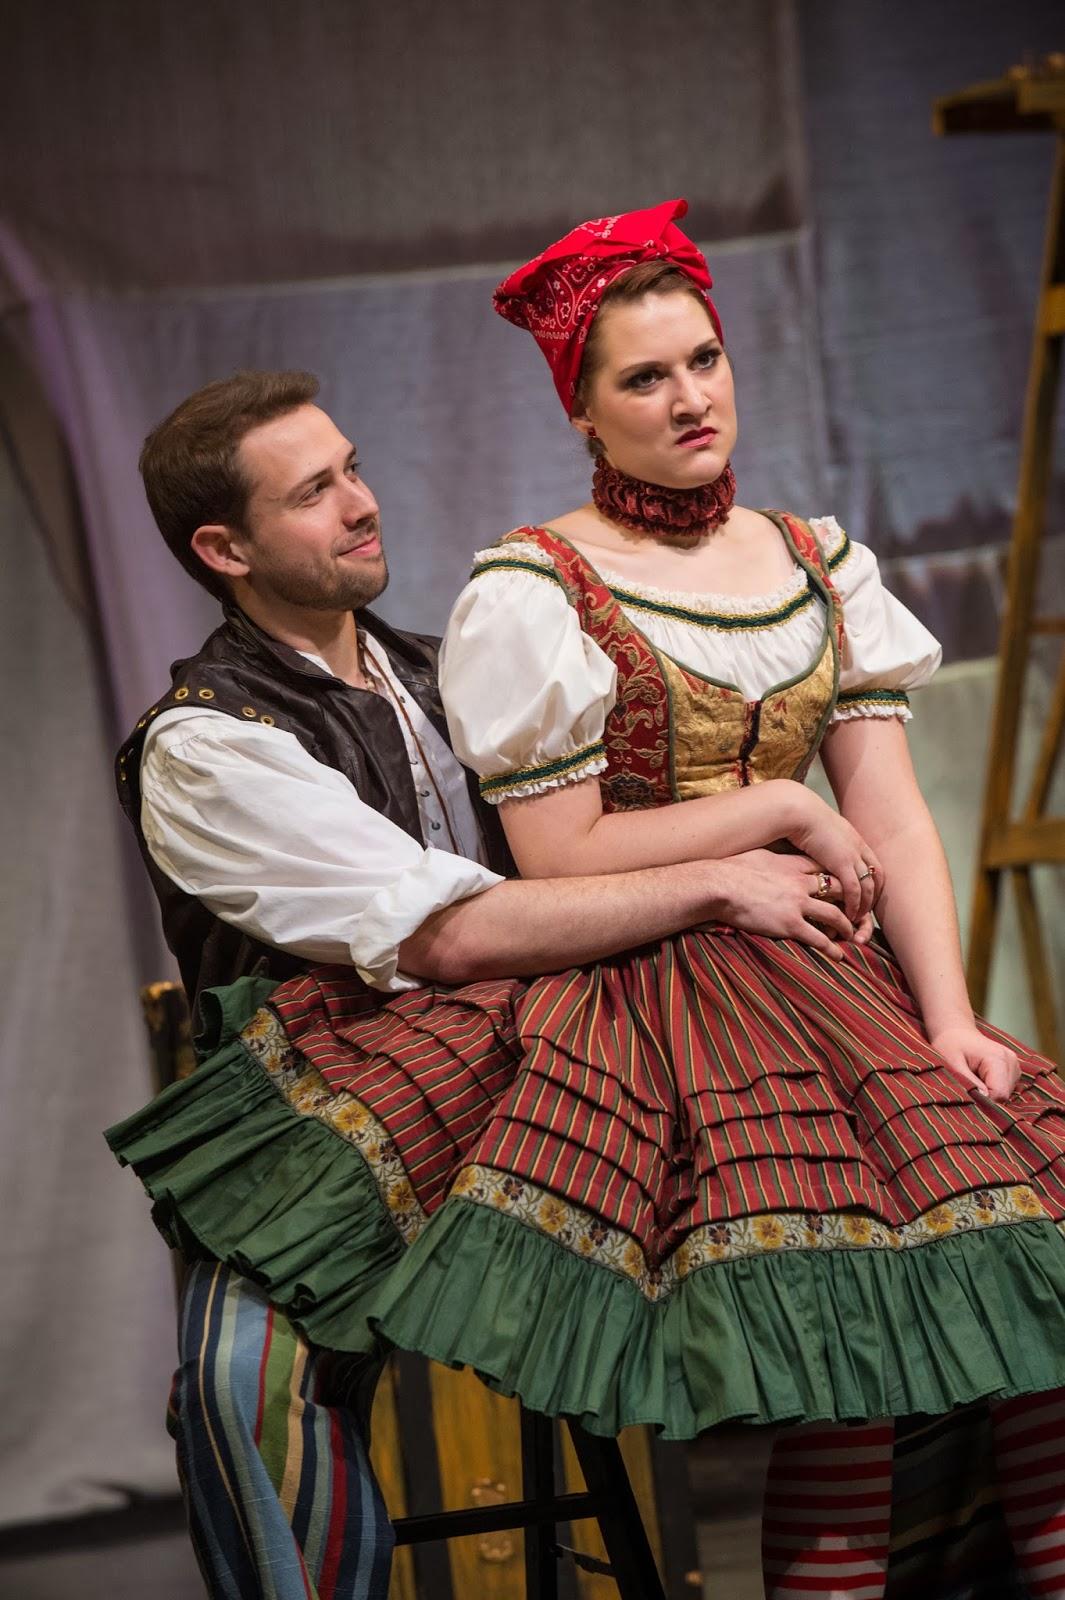 Littman (Petruchio), Hill (Kate), The Taming of the Shrew